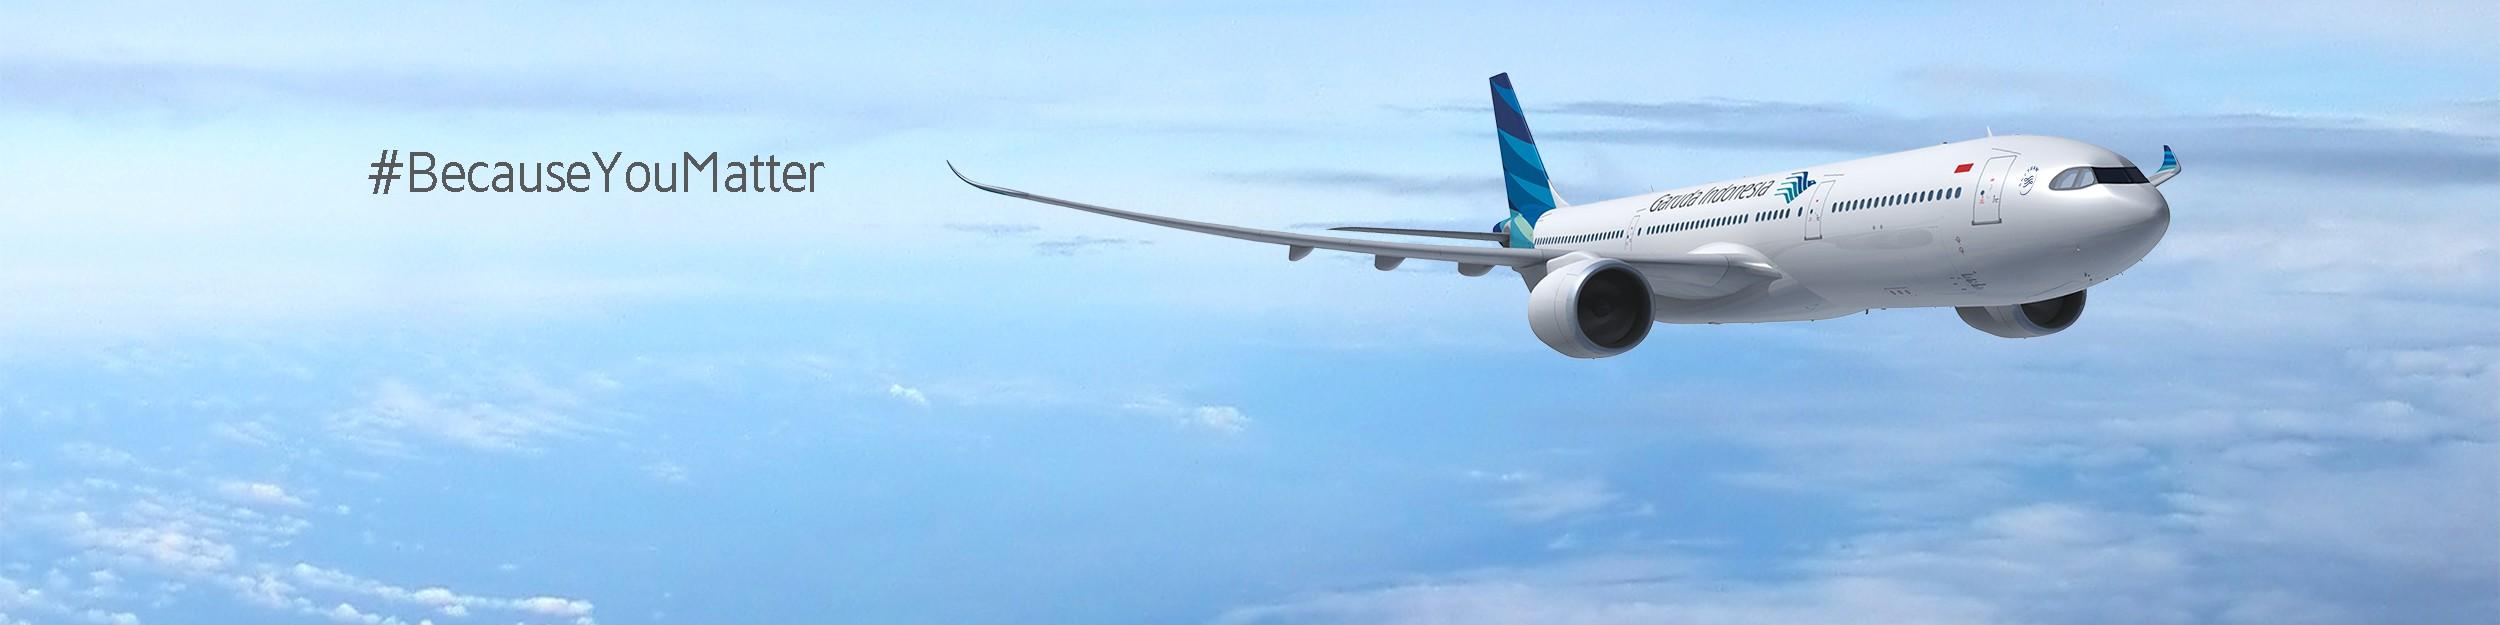 Garuda Indonesia Linkedin